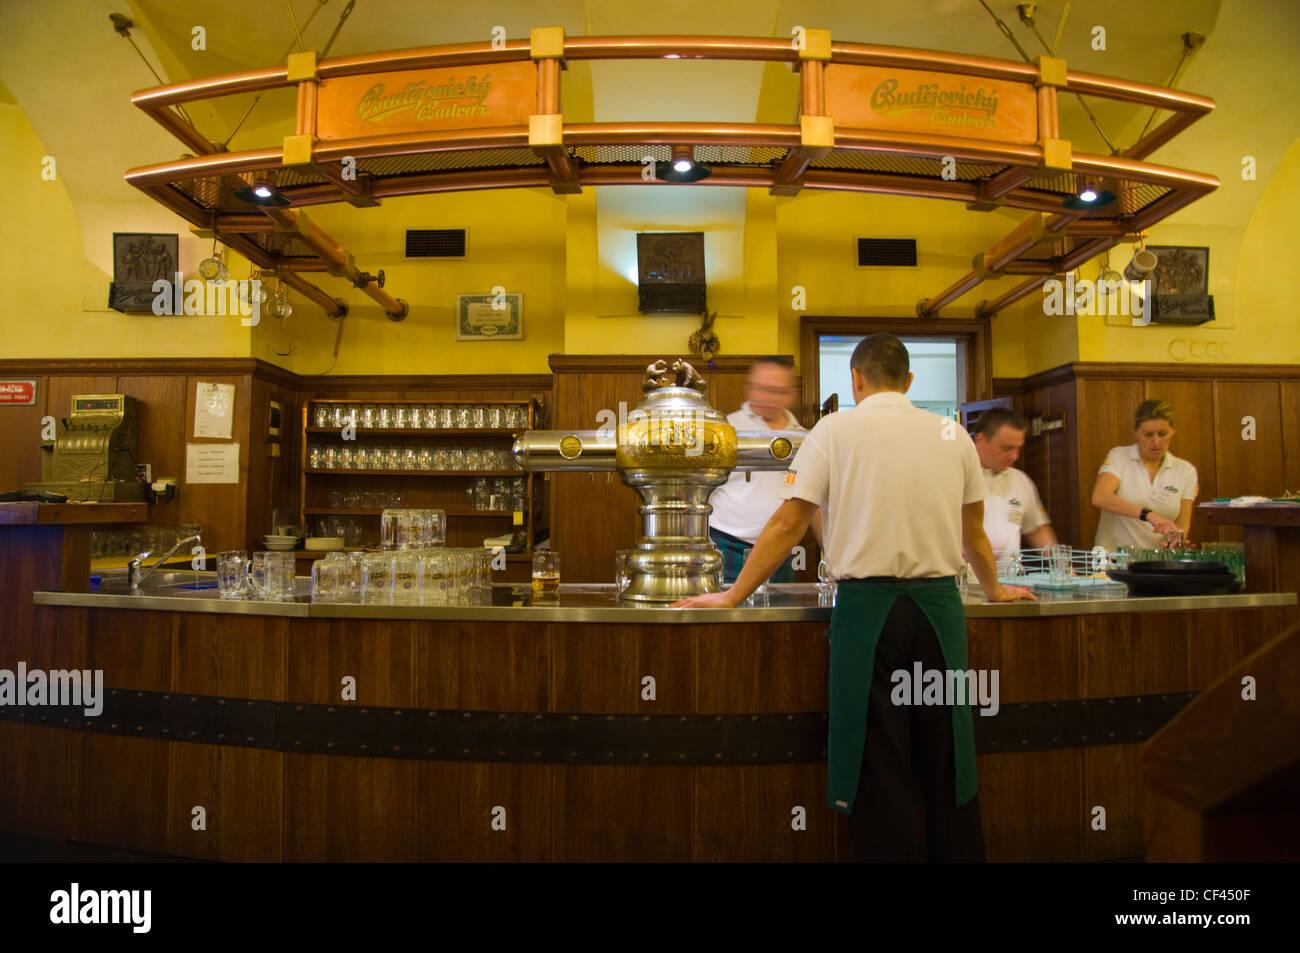 Bar counter and beer taps at U Medvidku restaurant microbrewery Prague Czech Republic Europe - Stock Image